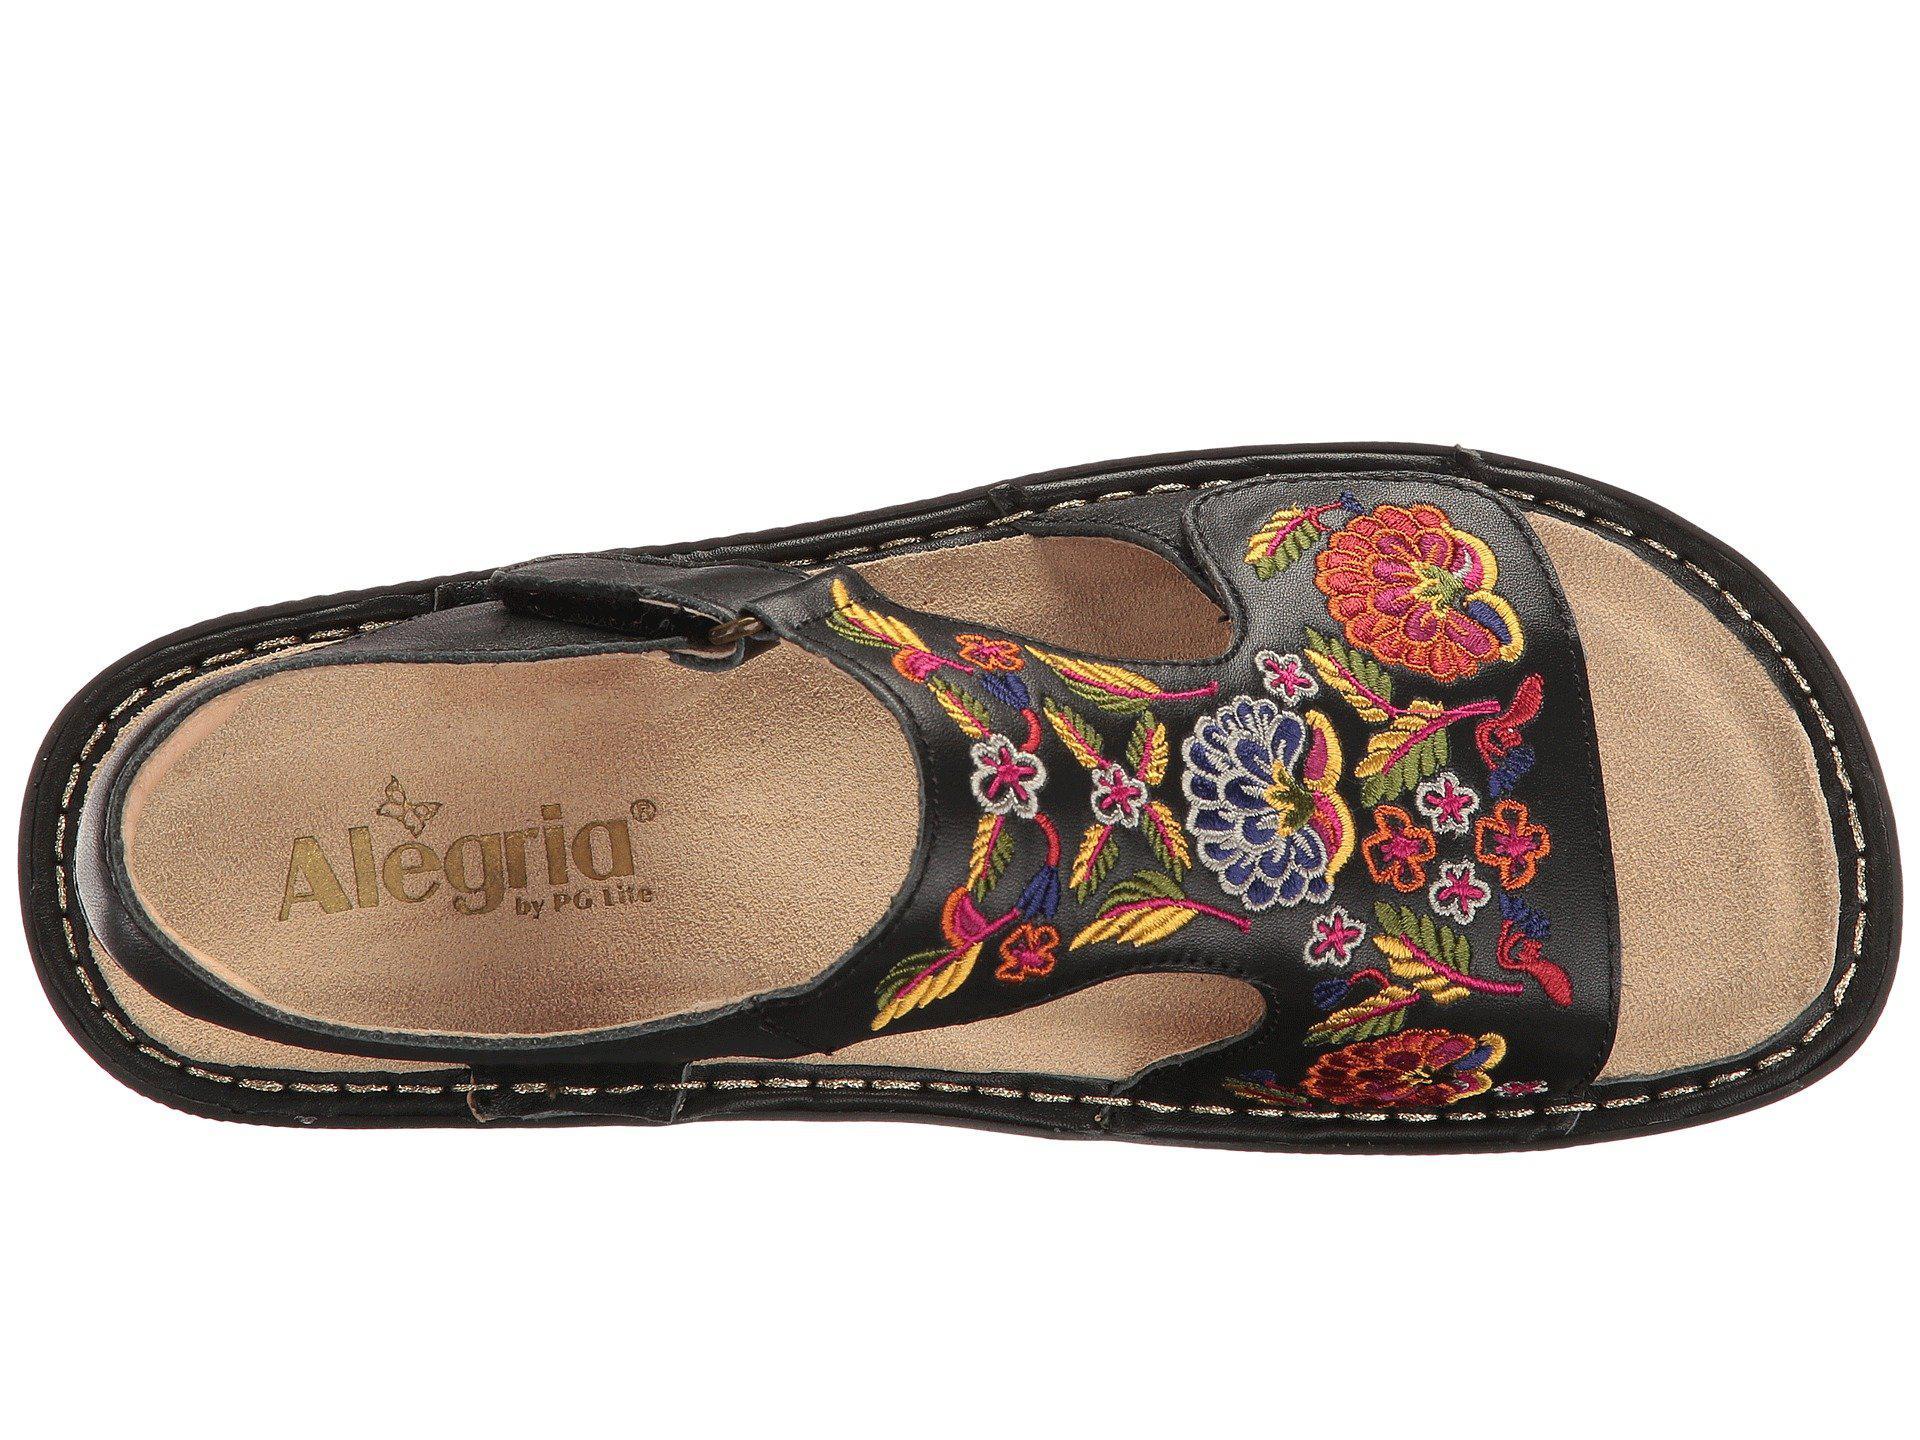 a3d2cfa36654 Alegria - Black Viki (cyclone Rainbow) Women s Lace-up Boots - Lyst. View  fullscreen